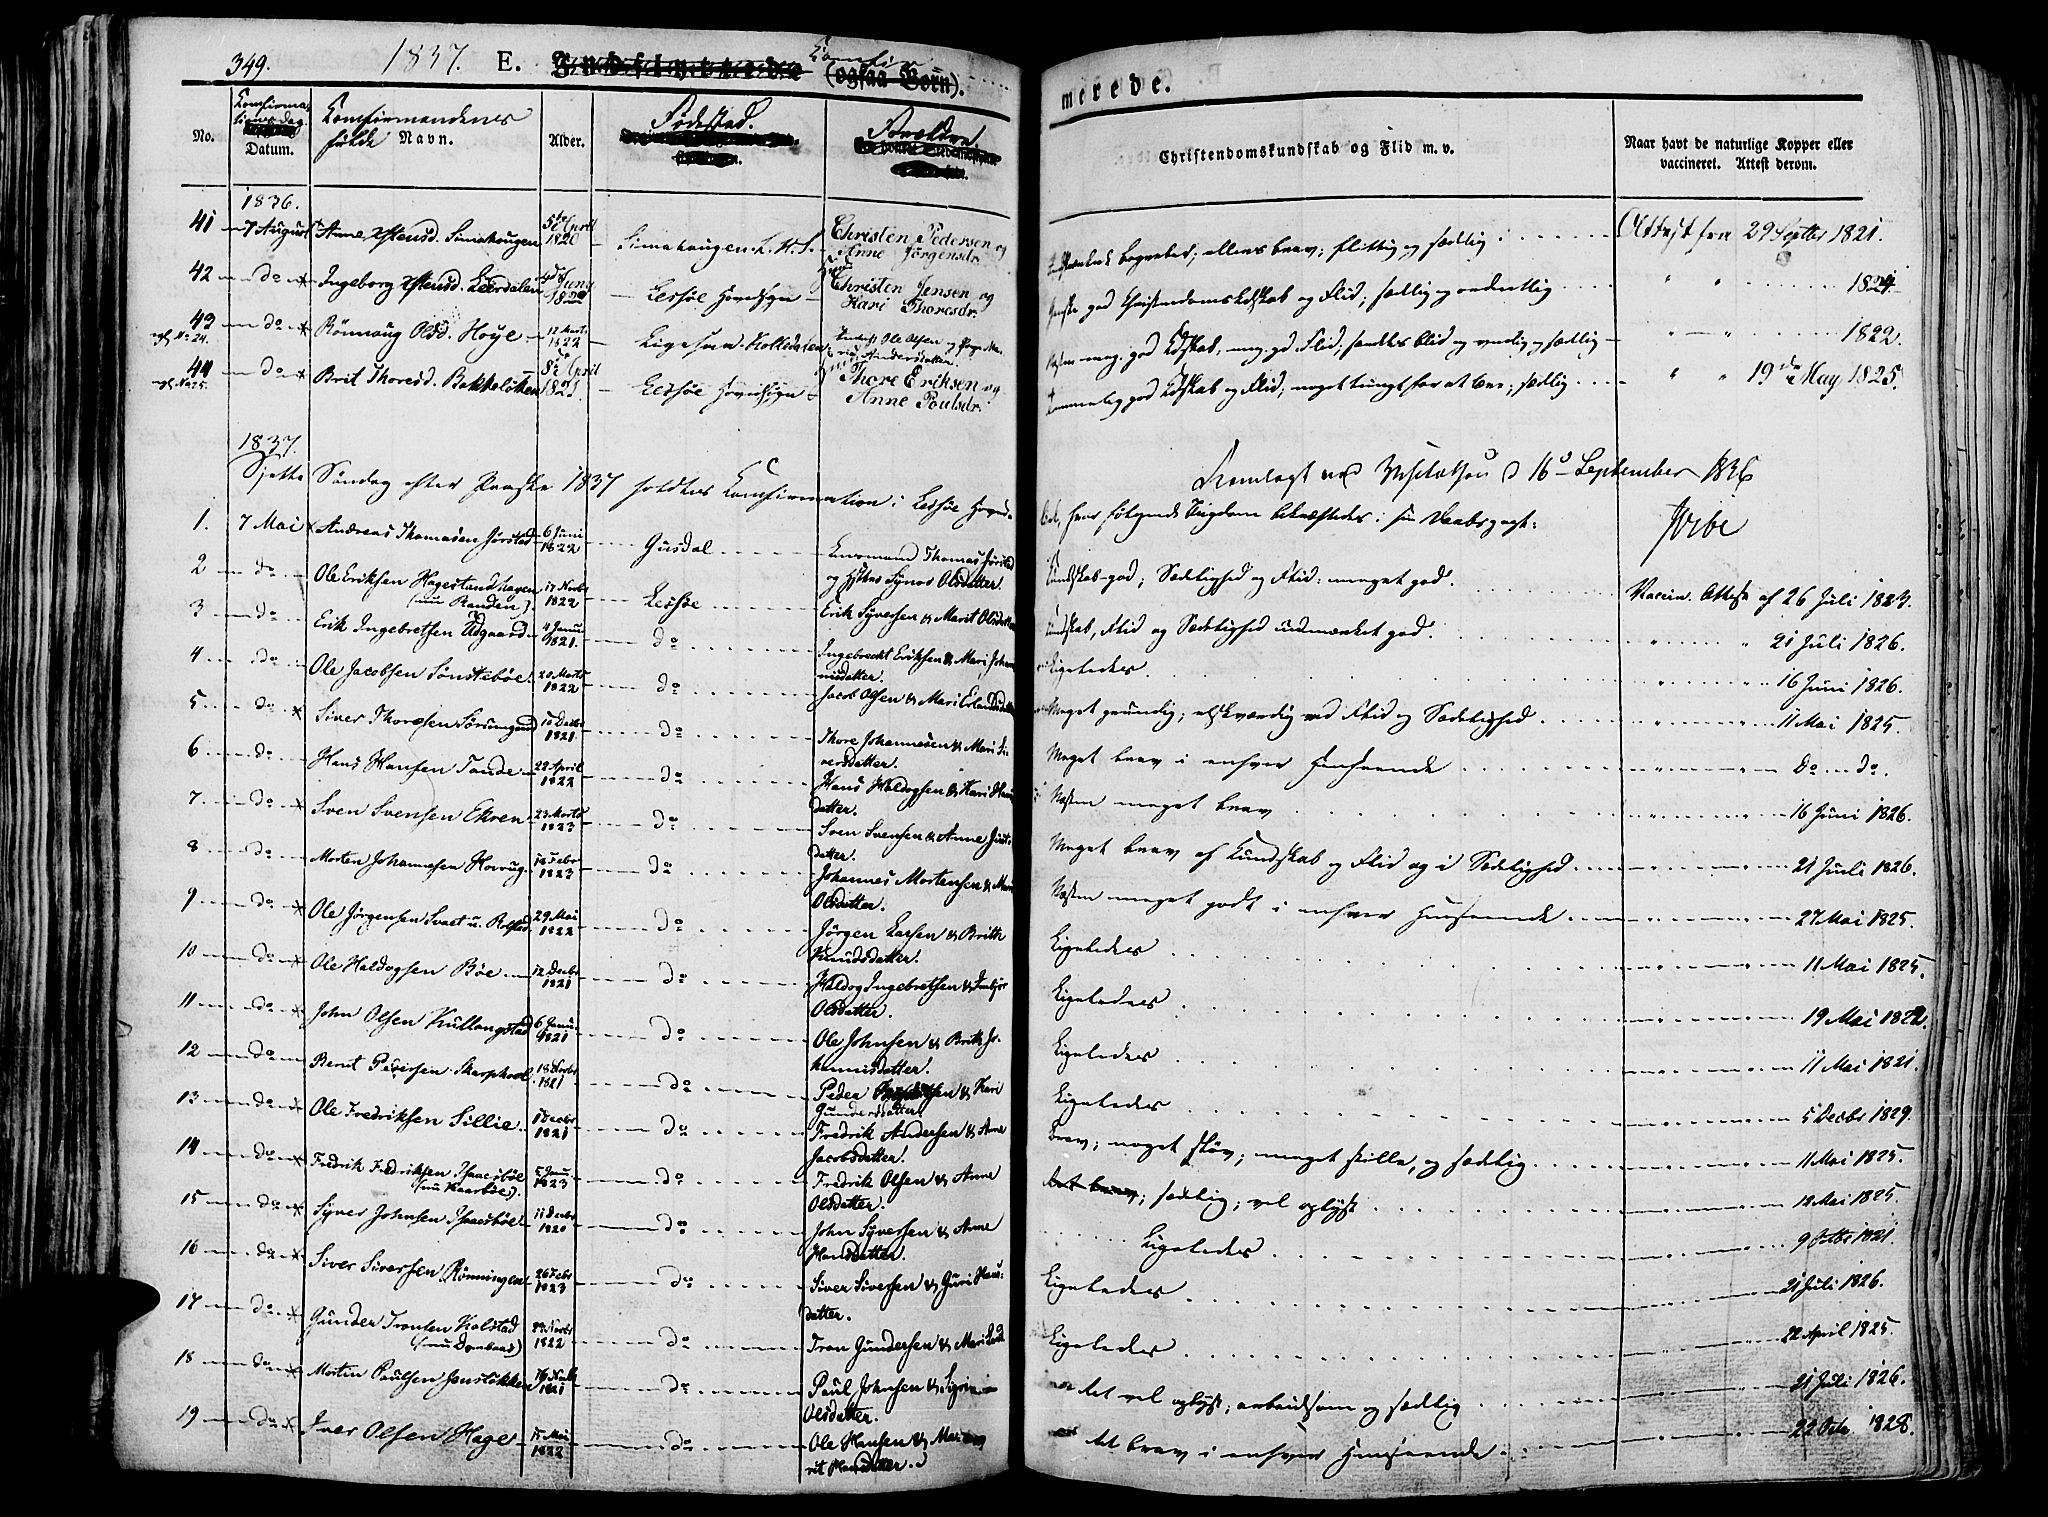 SAH, Lesja prestekontor, Ministerialbok nr. 5, 1830-1842, s. 349